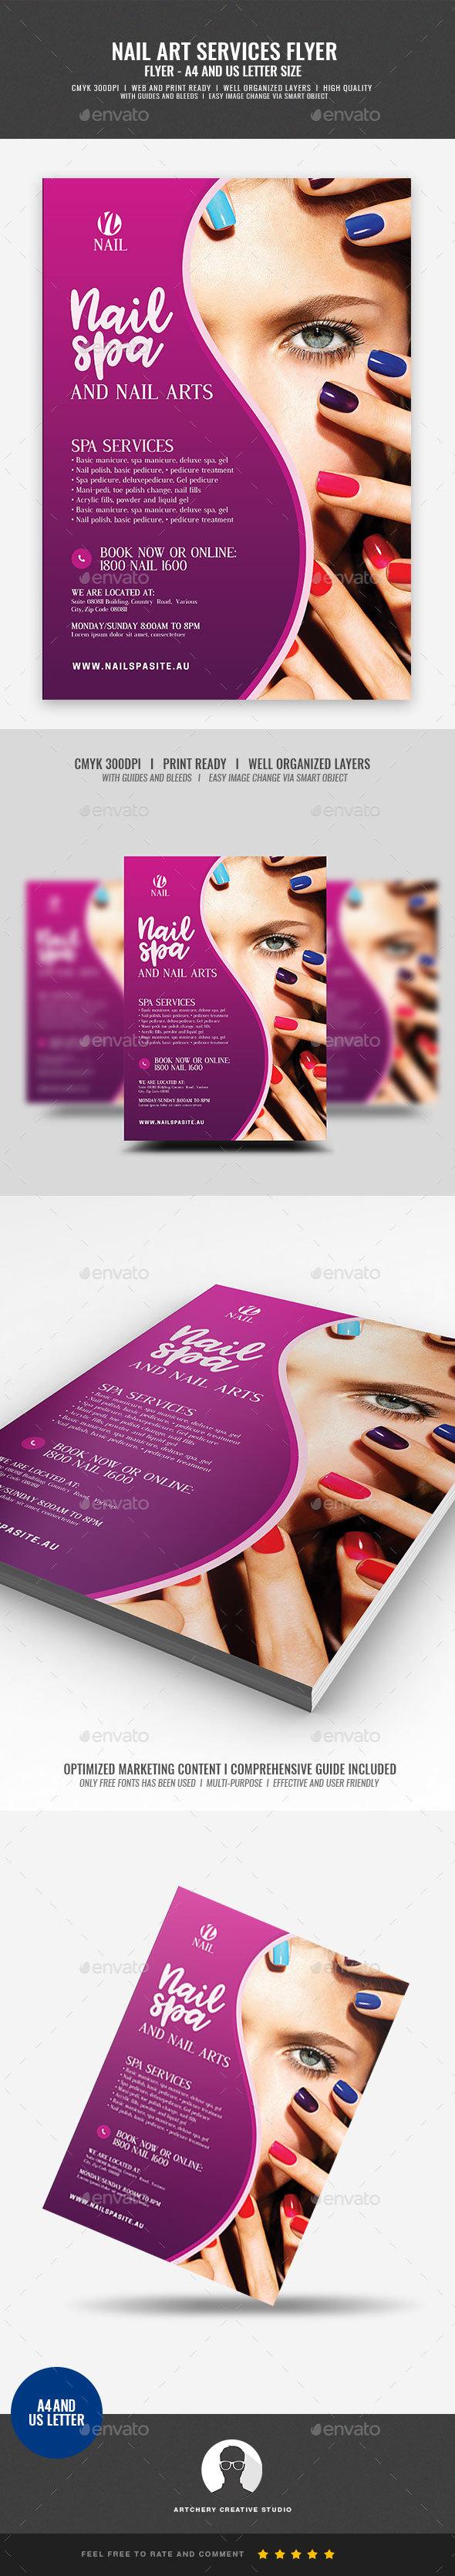 nail salon services flyer by artchery graphicriver